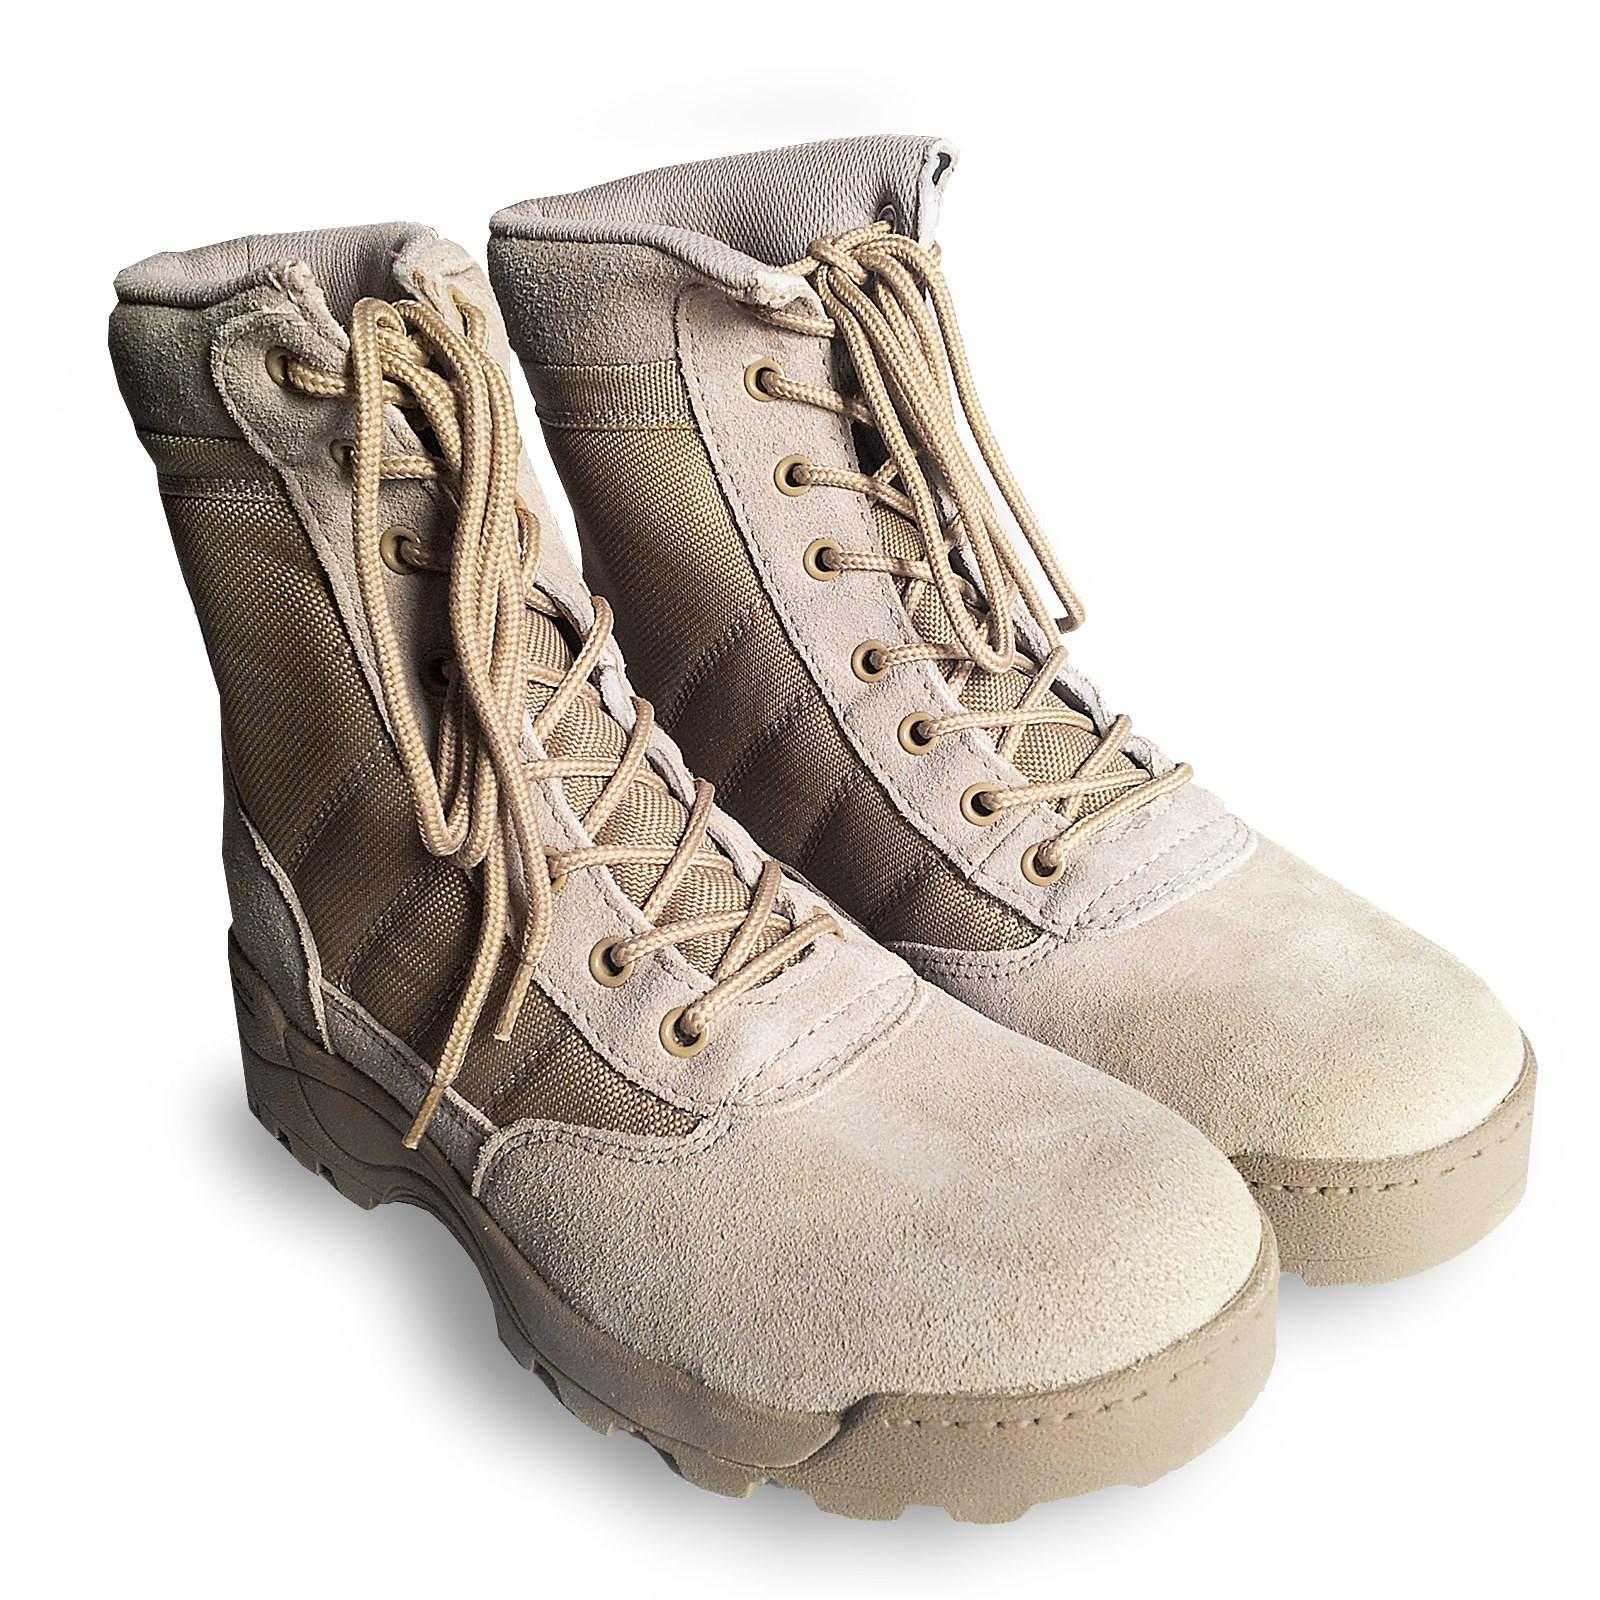 Anfibi Stivali Militari Scarpe Scarponi per Softair Caccia Tan Taglia 41  Royal 33f1bfa874b